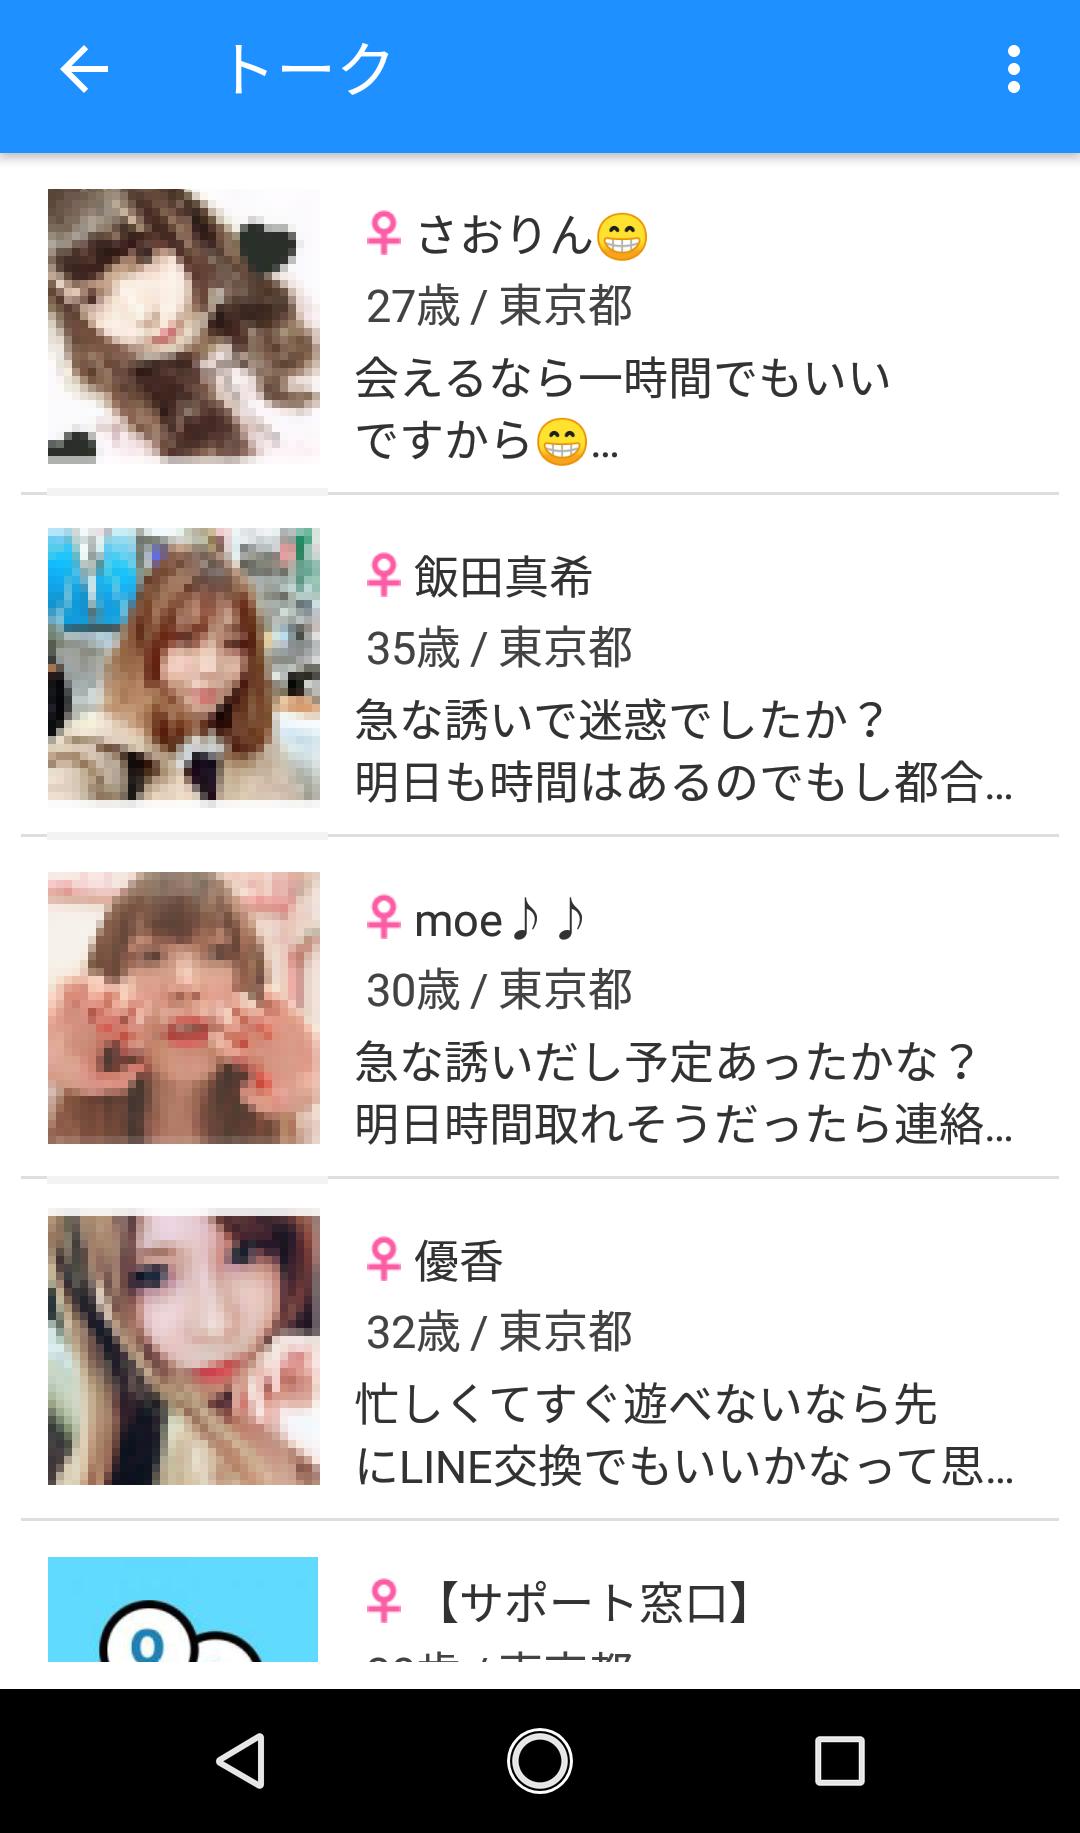 mail 4 - 「Joypri」はサクラ詐欺アプリ